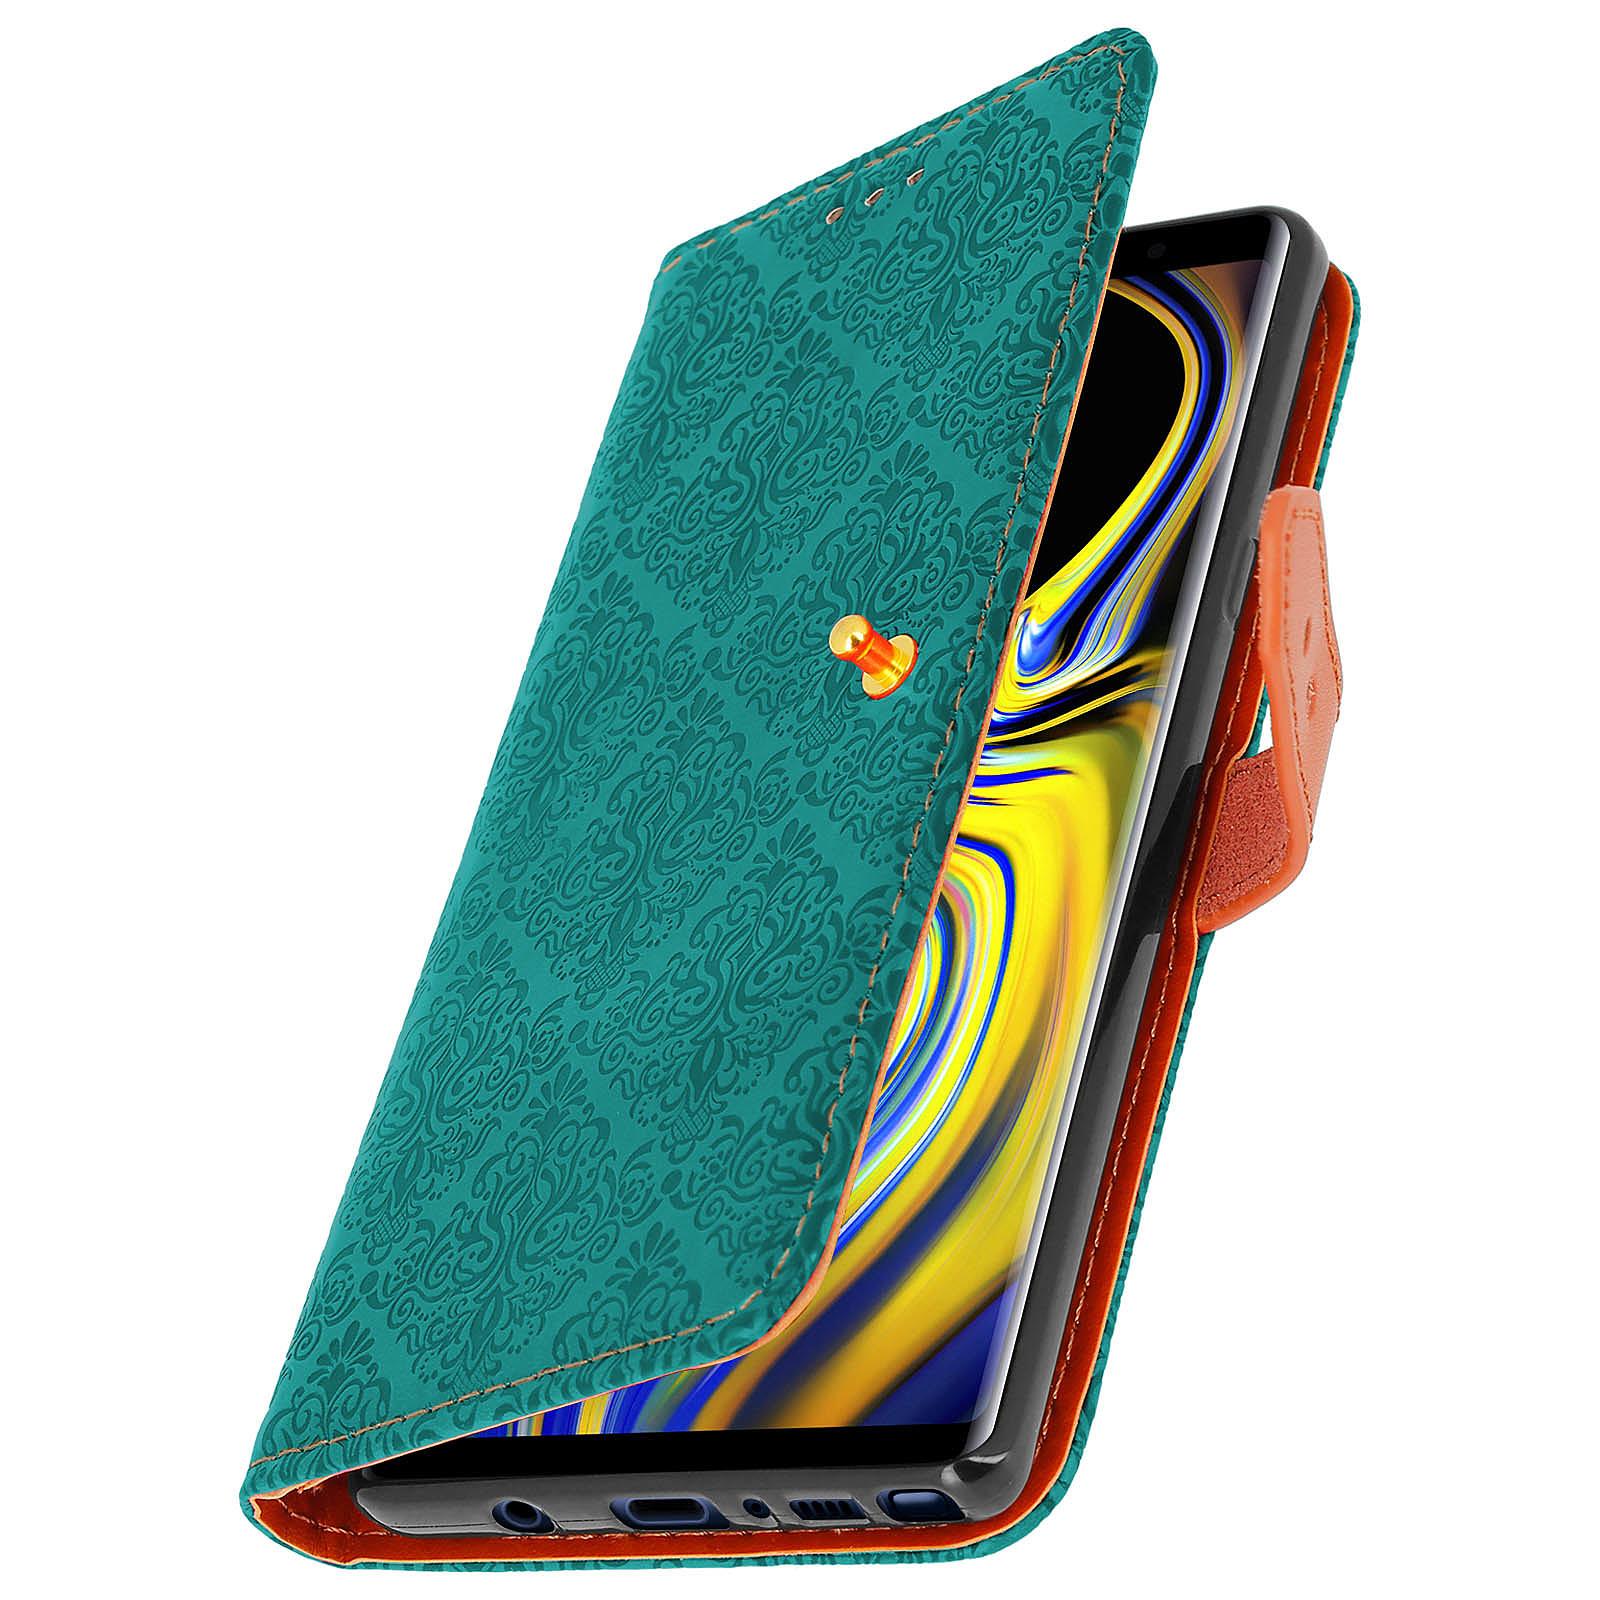 Avizar Etui folio Bleu pour Samsung Galaxy Note 9